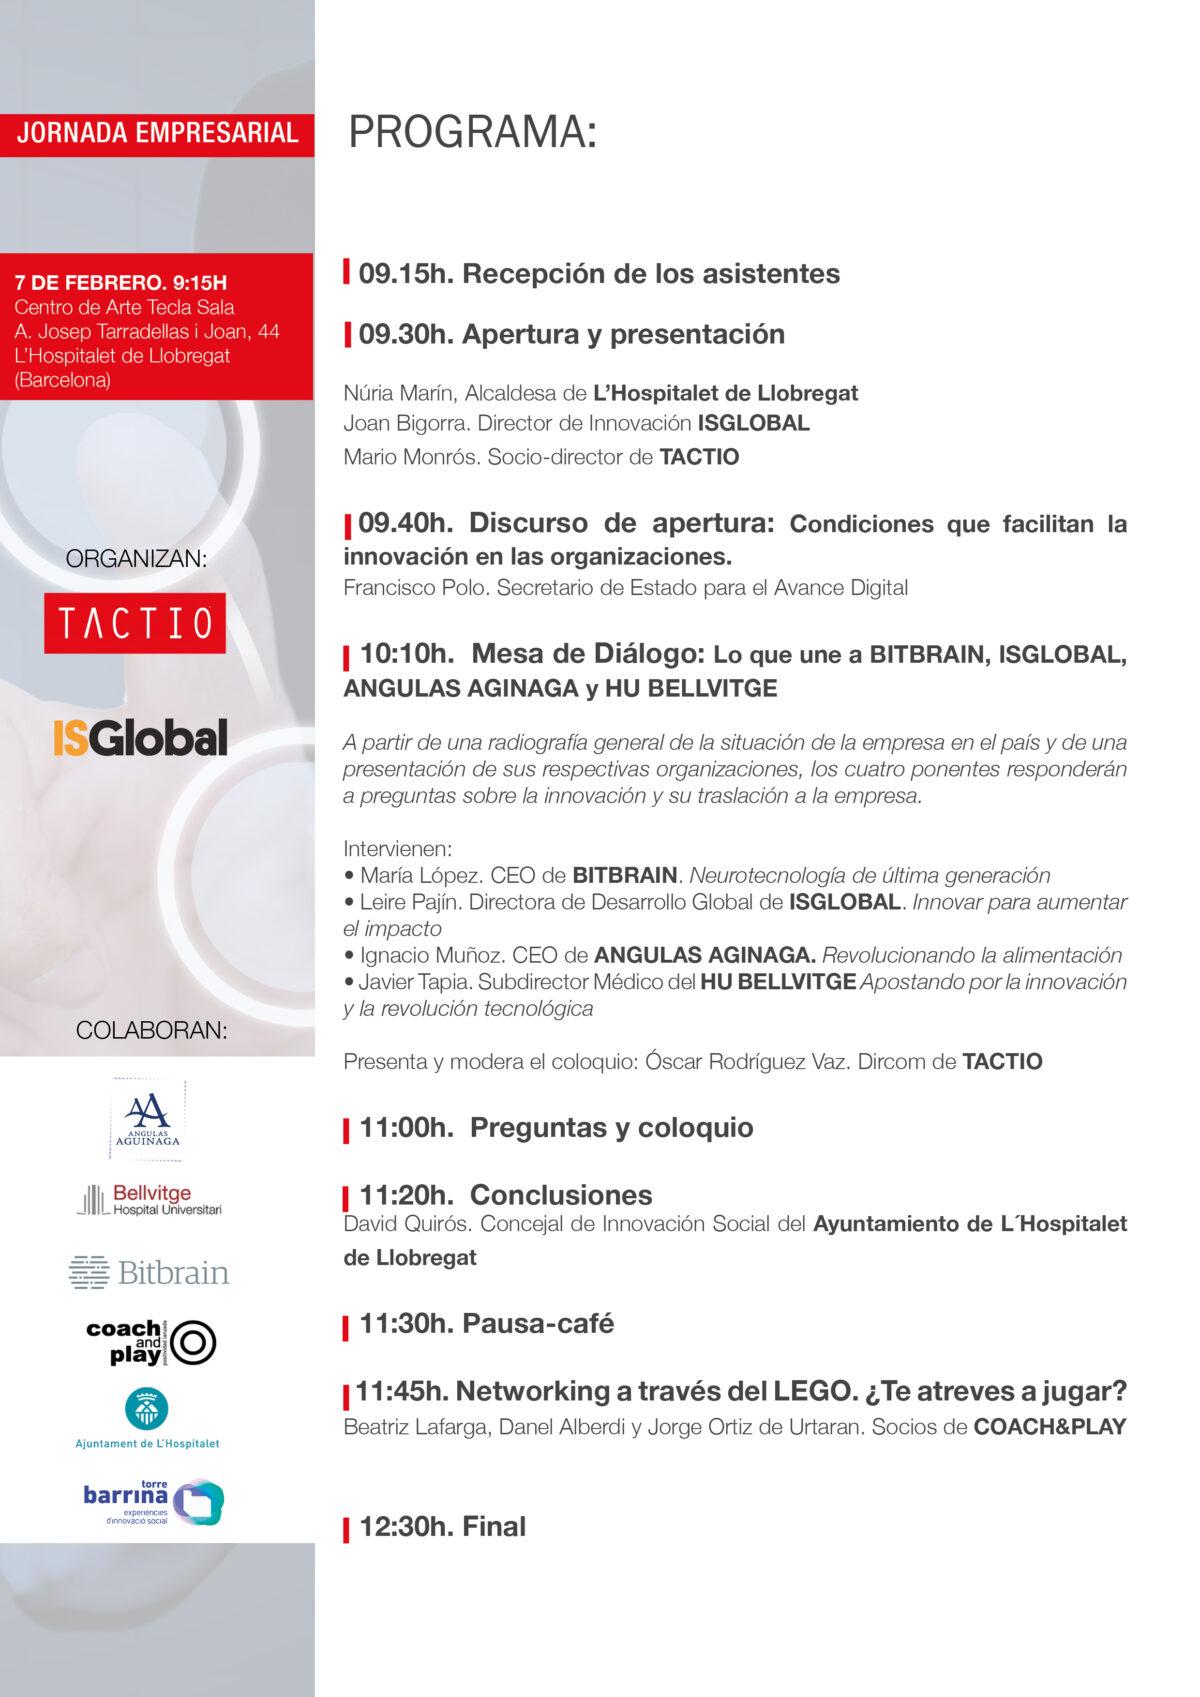 Programa Jornada Empresarial TACTIO de innovación.